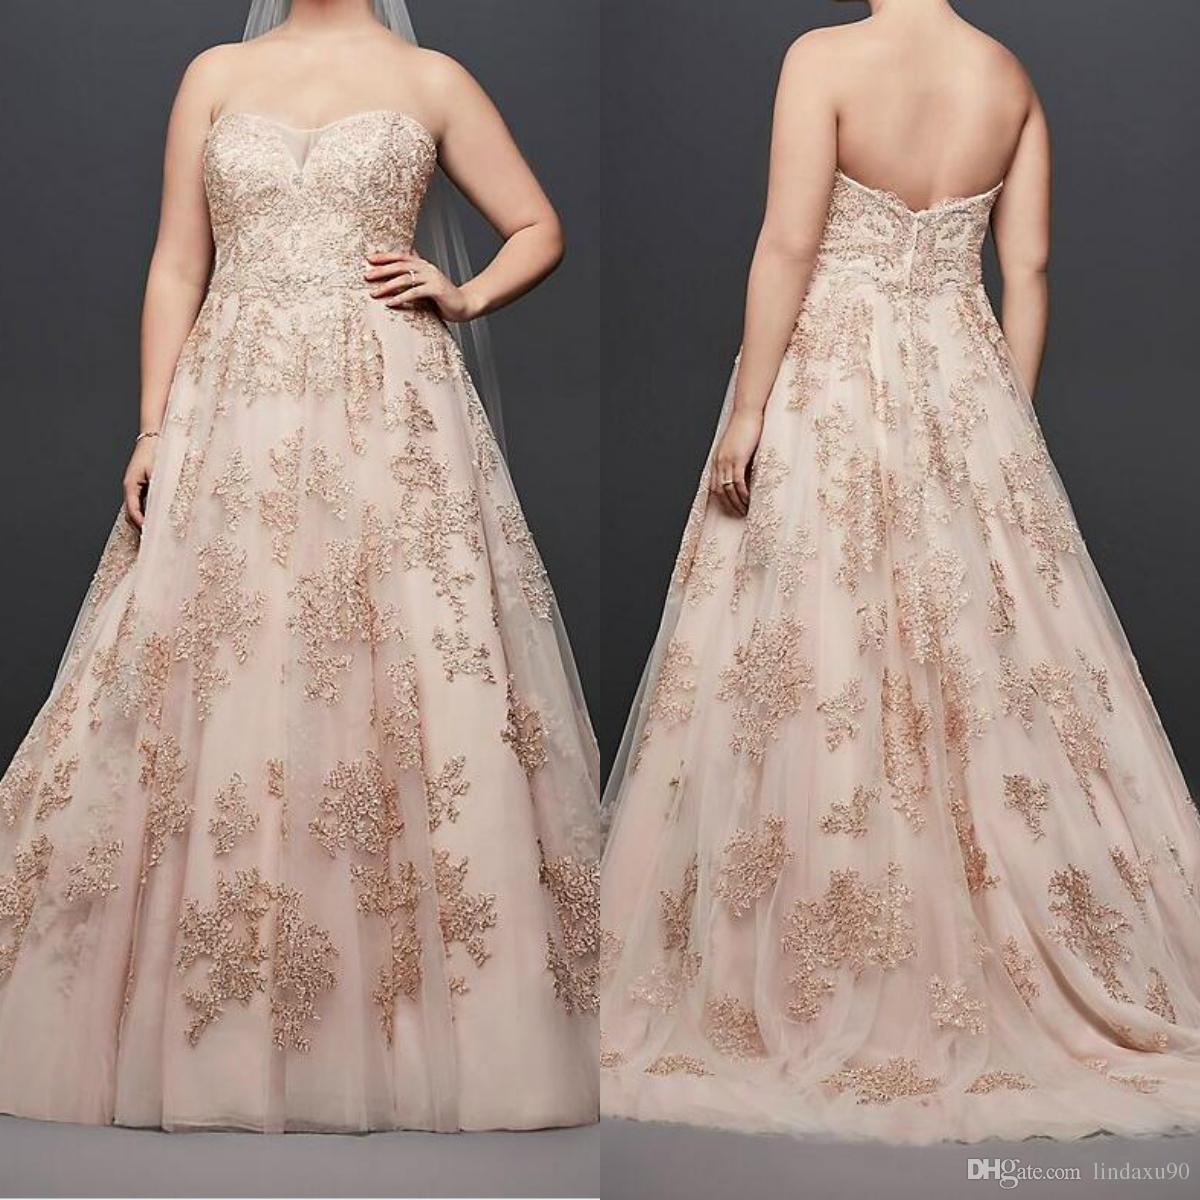 98fdf0d47bd Oleg Cassini Metallic Lace Plus Size Wedding Dresses Sweetheart Lace  Appliqued Beads 2019 Princess Garden Wedding Dress Bridal Gowns Wedding  Dress Wedding ...